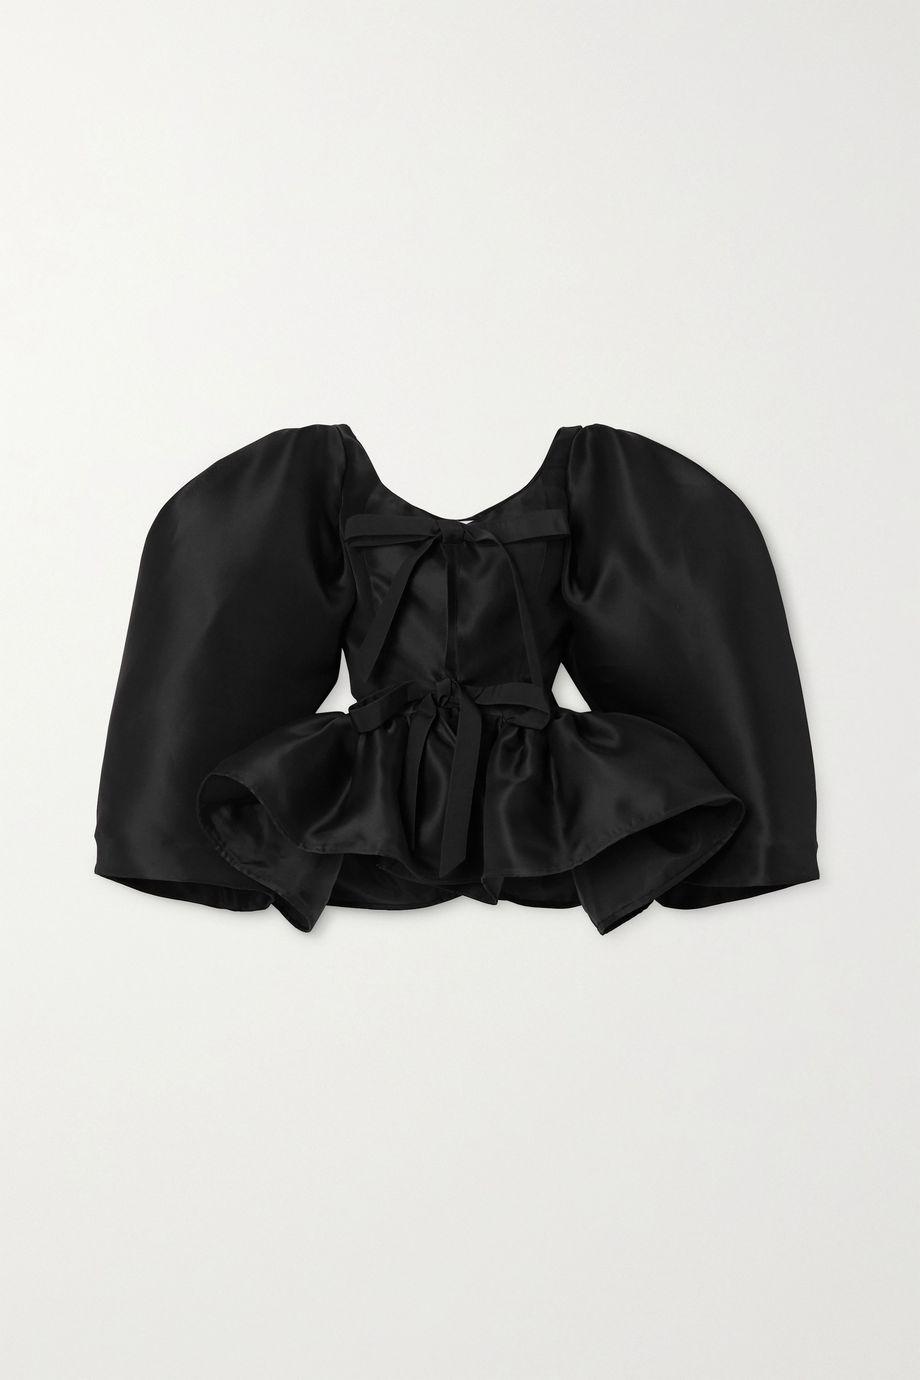 Christopher John Rogers Tie-front silk-gazar peplum blouse